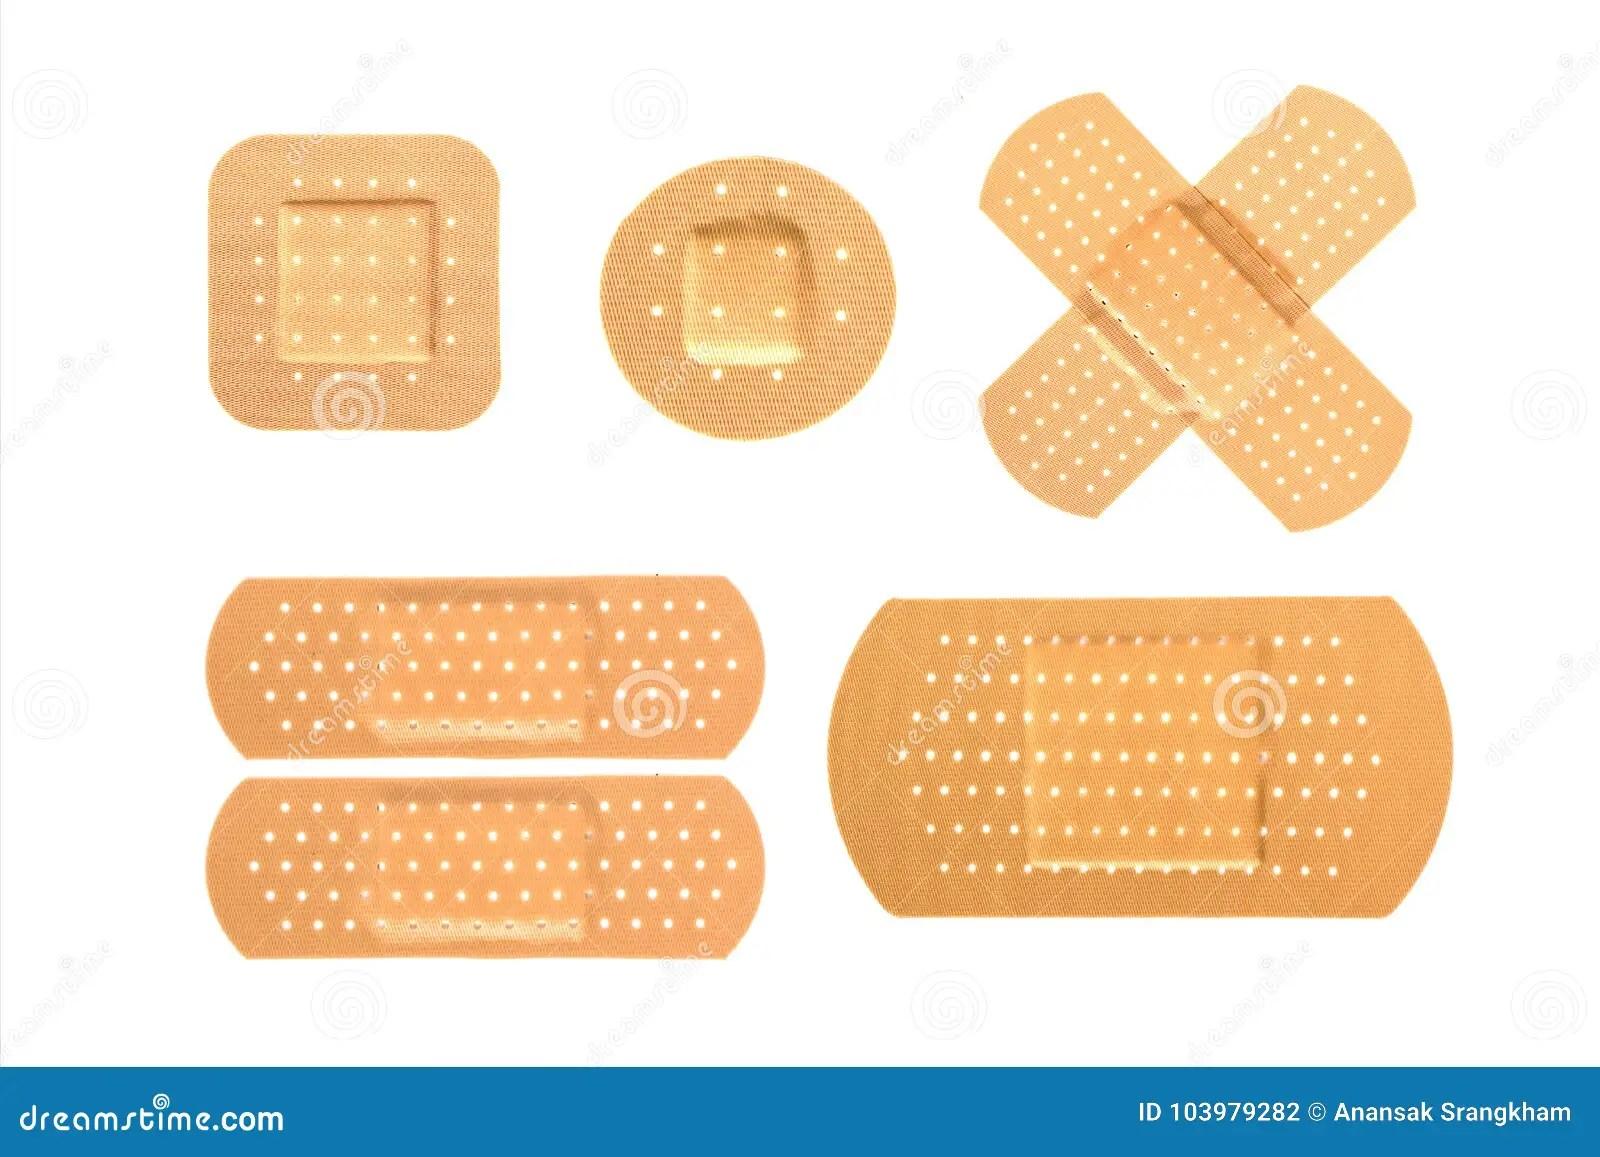 hight resolution of bandaid set on isolate background